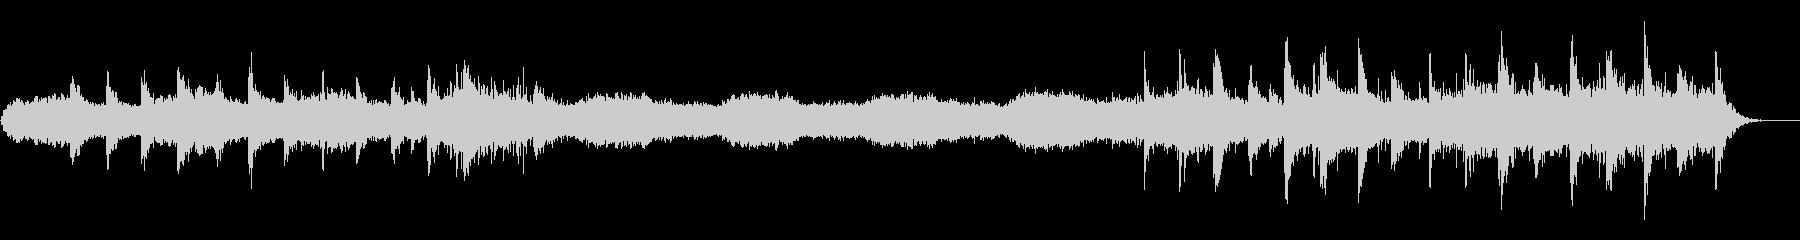 b Flなし企業PV向け静謐で神秘的な曲の未再生の波形